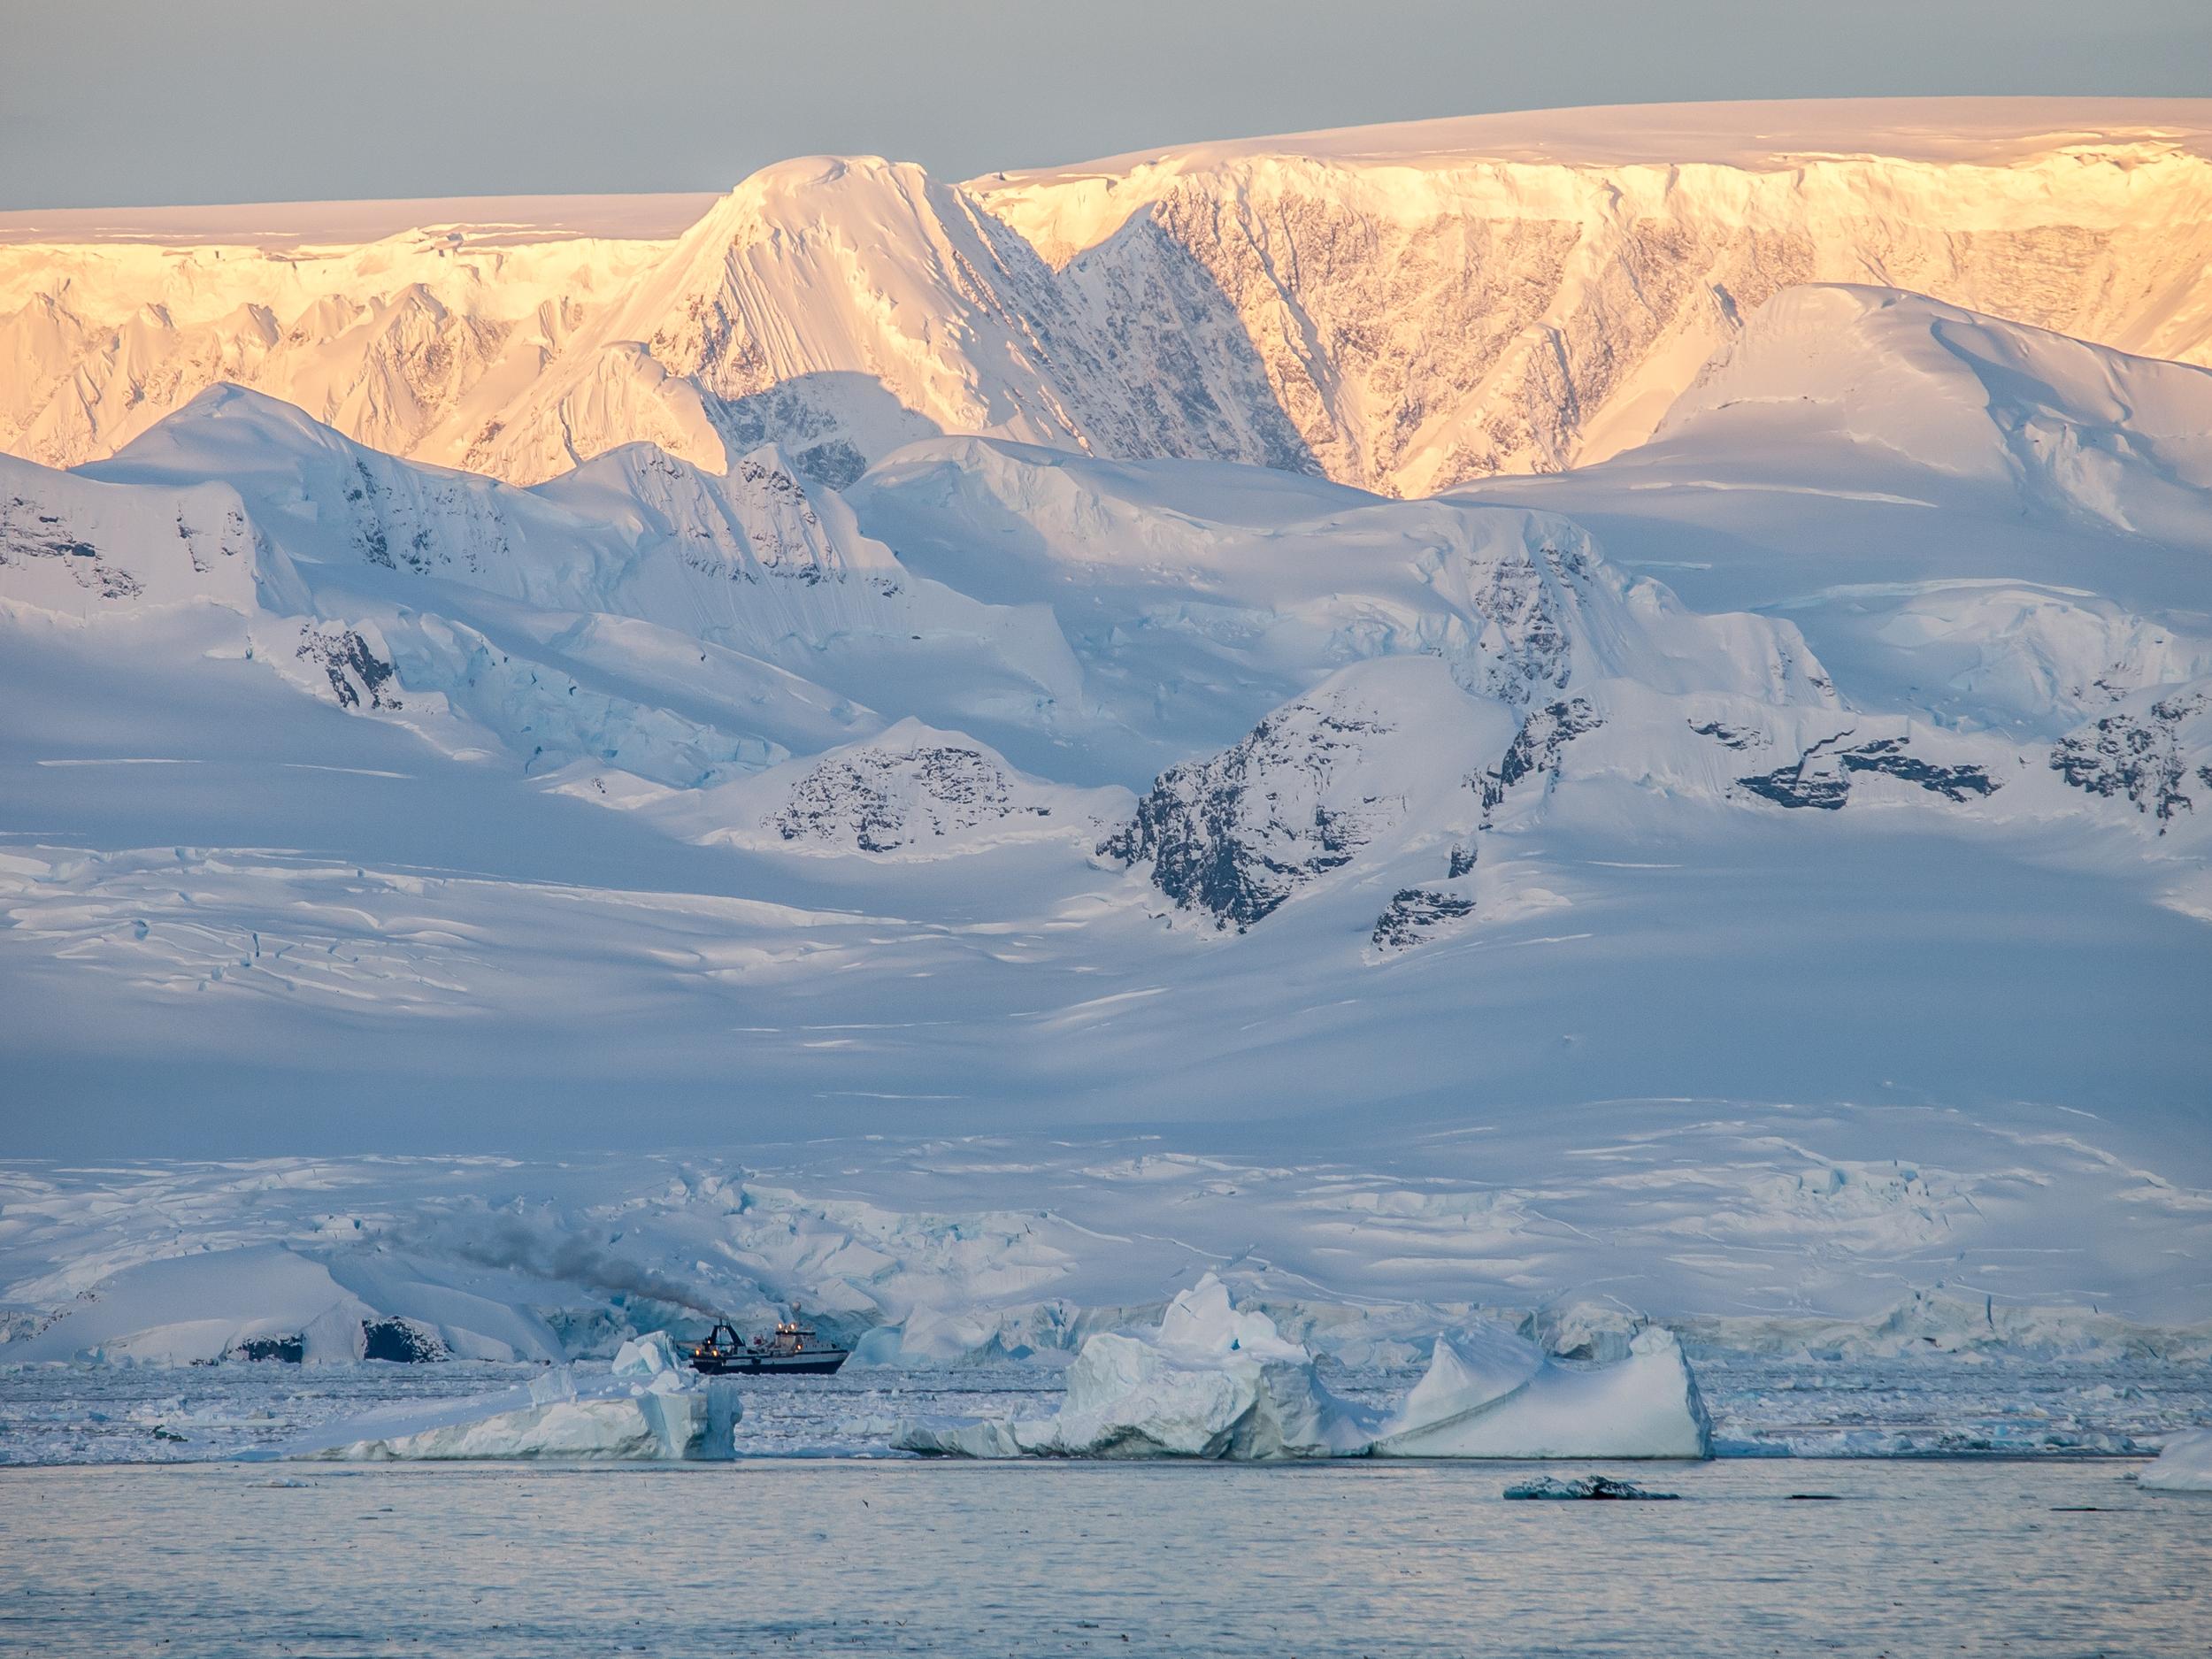 Humpback whale Photo: Frank Grebstad